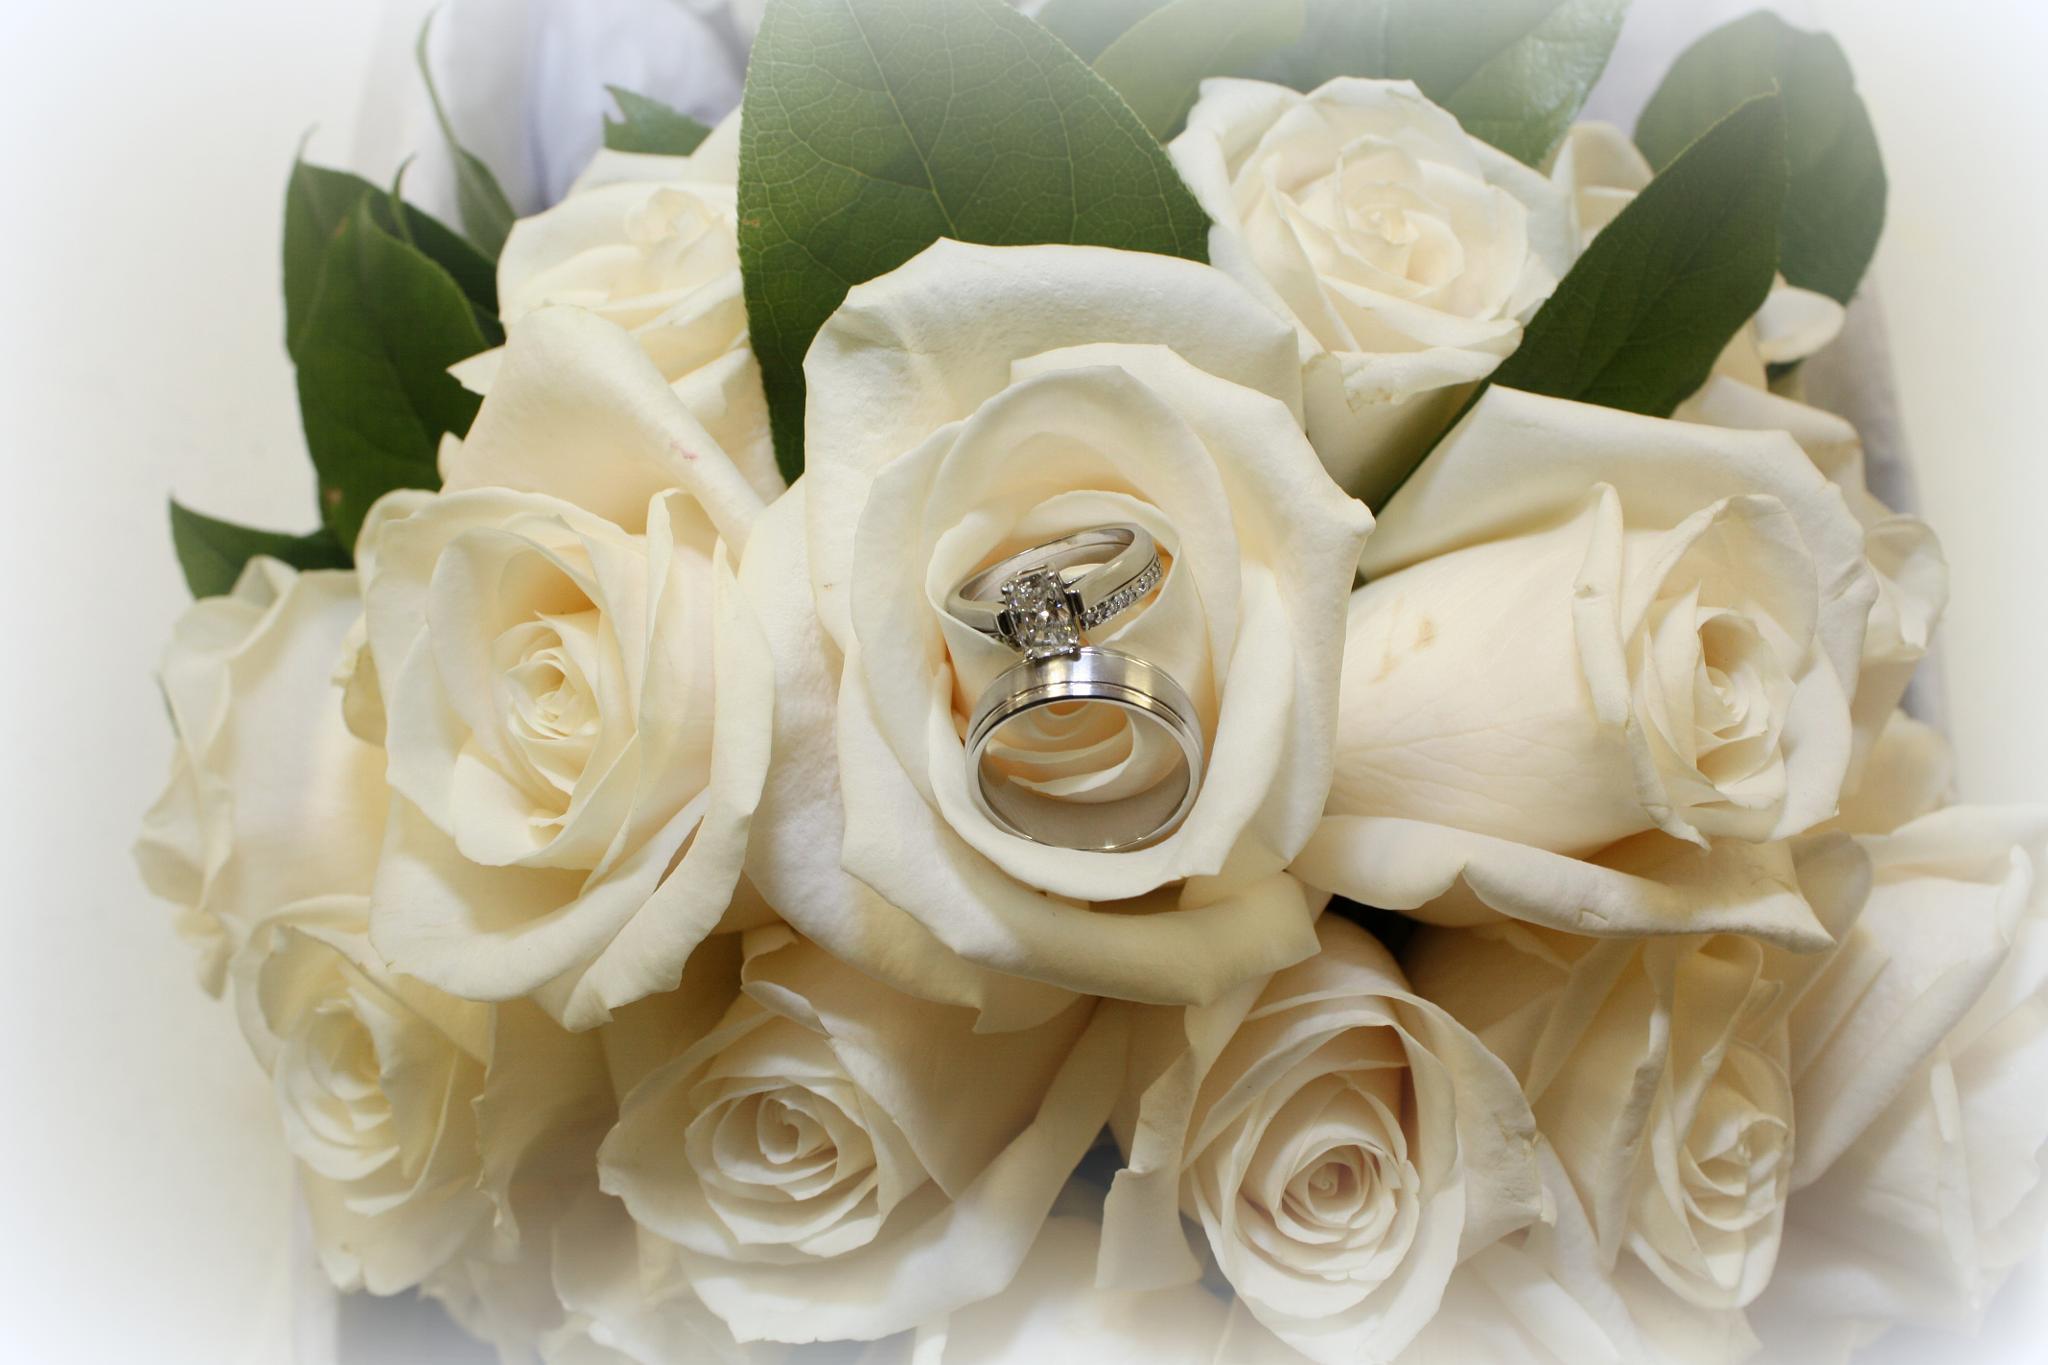 Wedding Rings in bouquet by Nicole Bixby